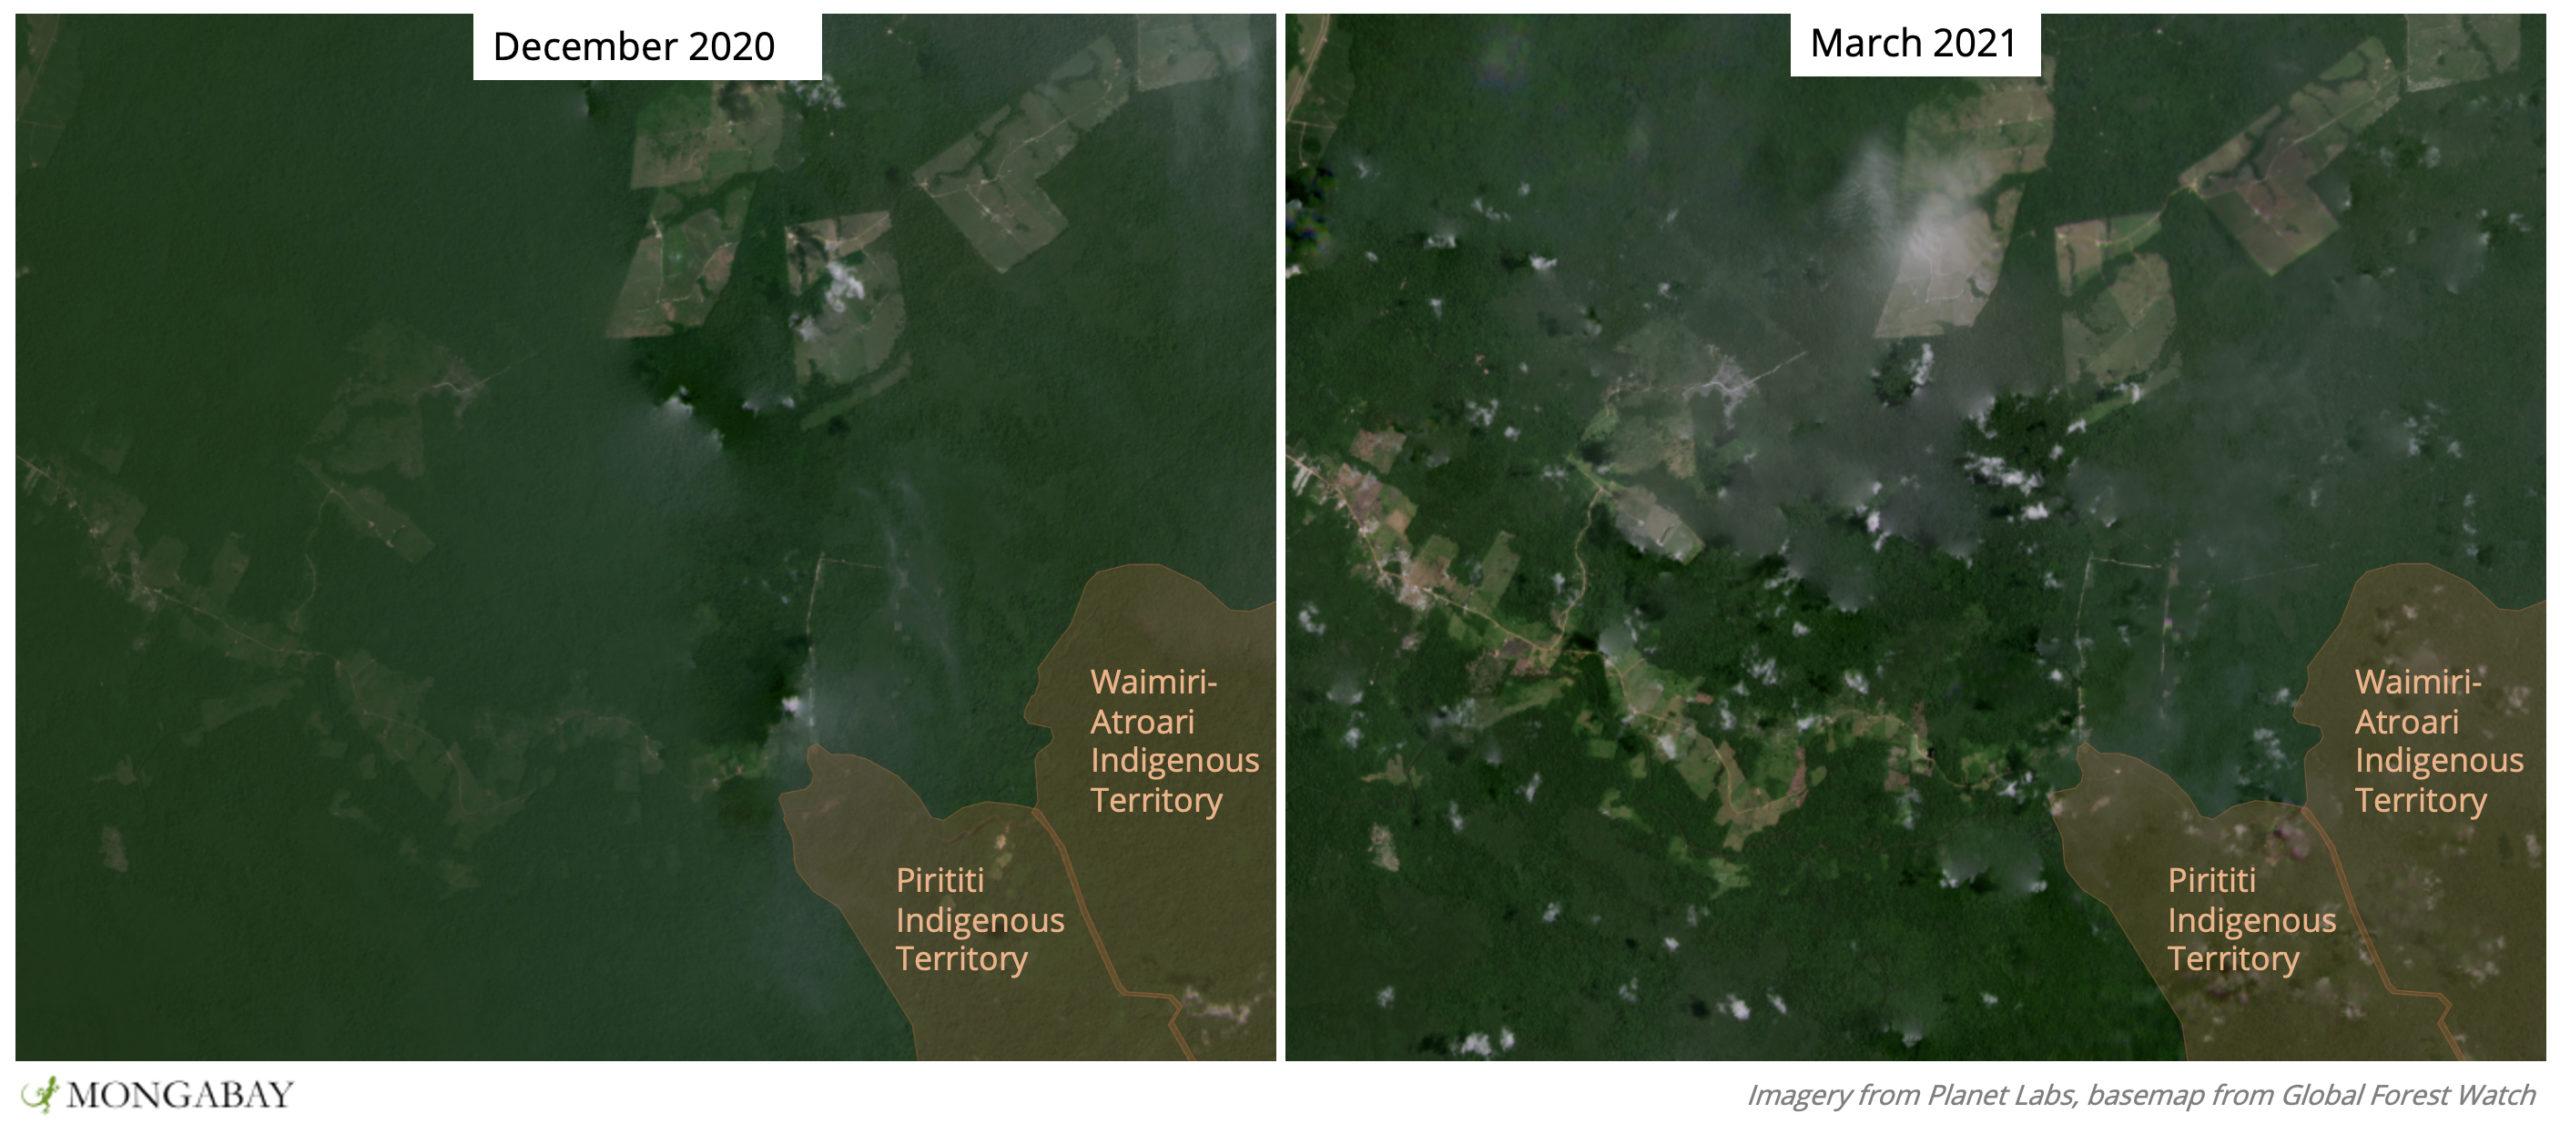 Satellite images show recent deforestation near Waimiri-Atroari Indigenous Territory.